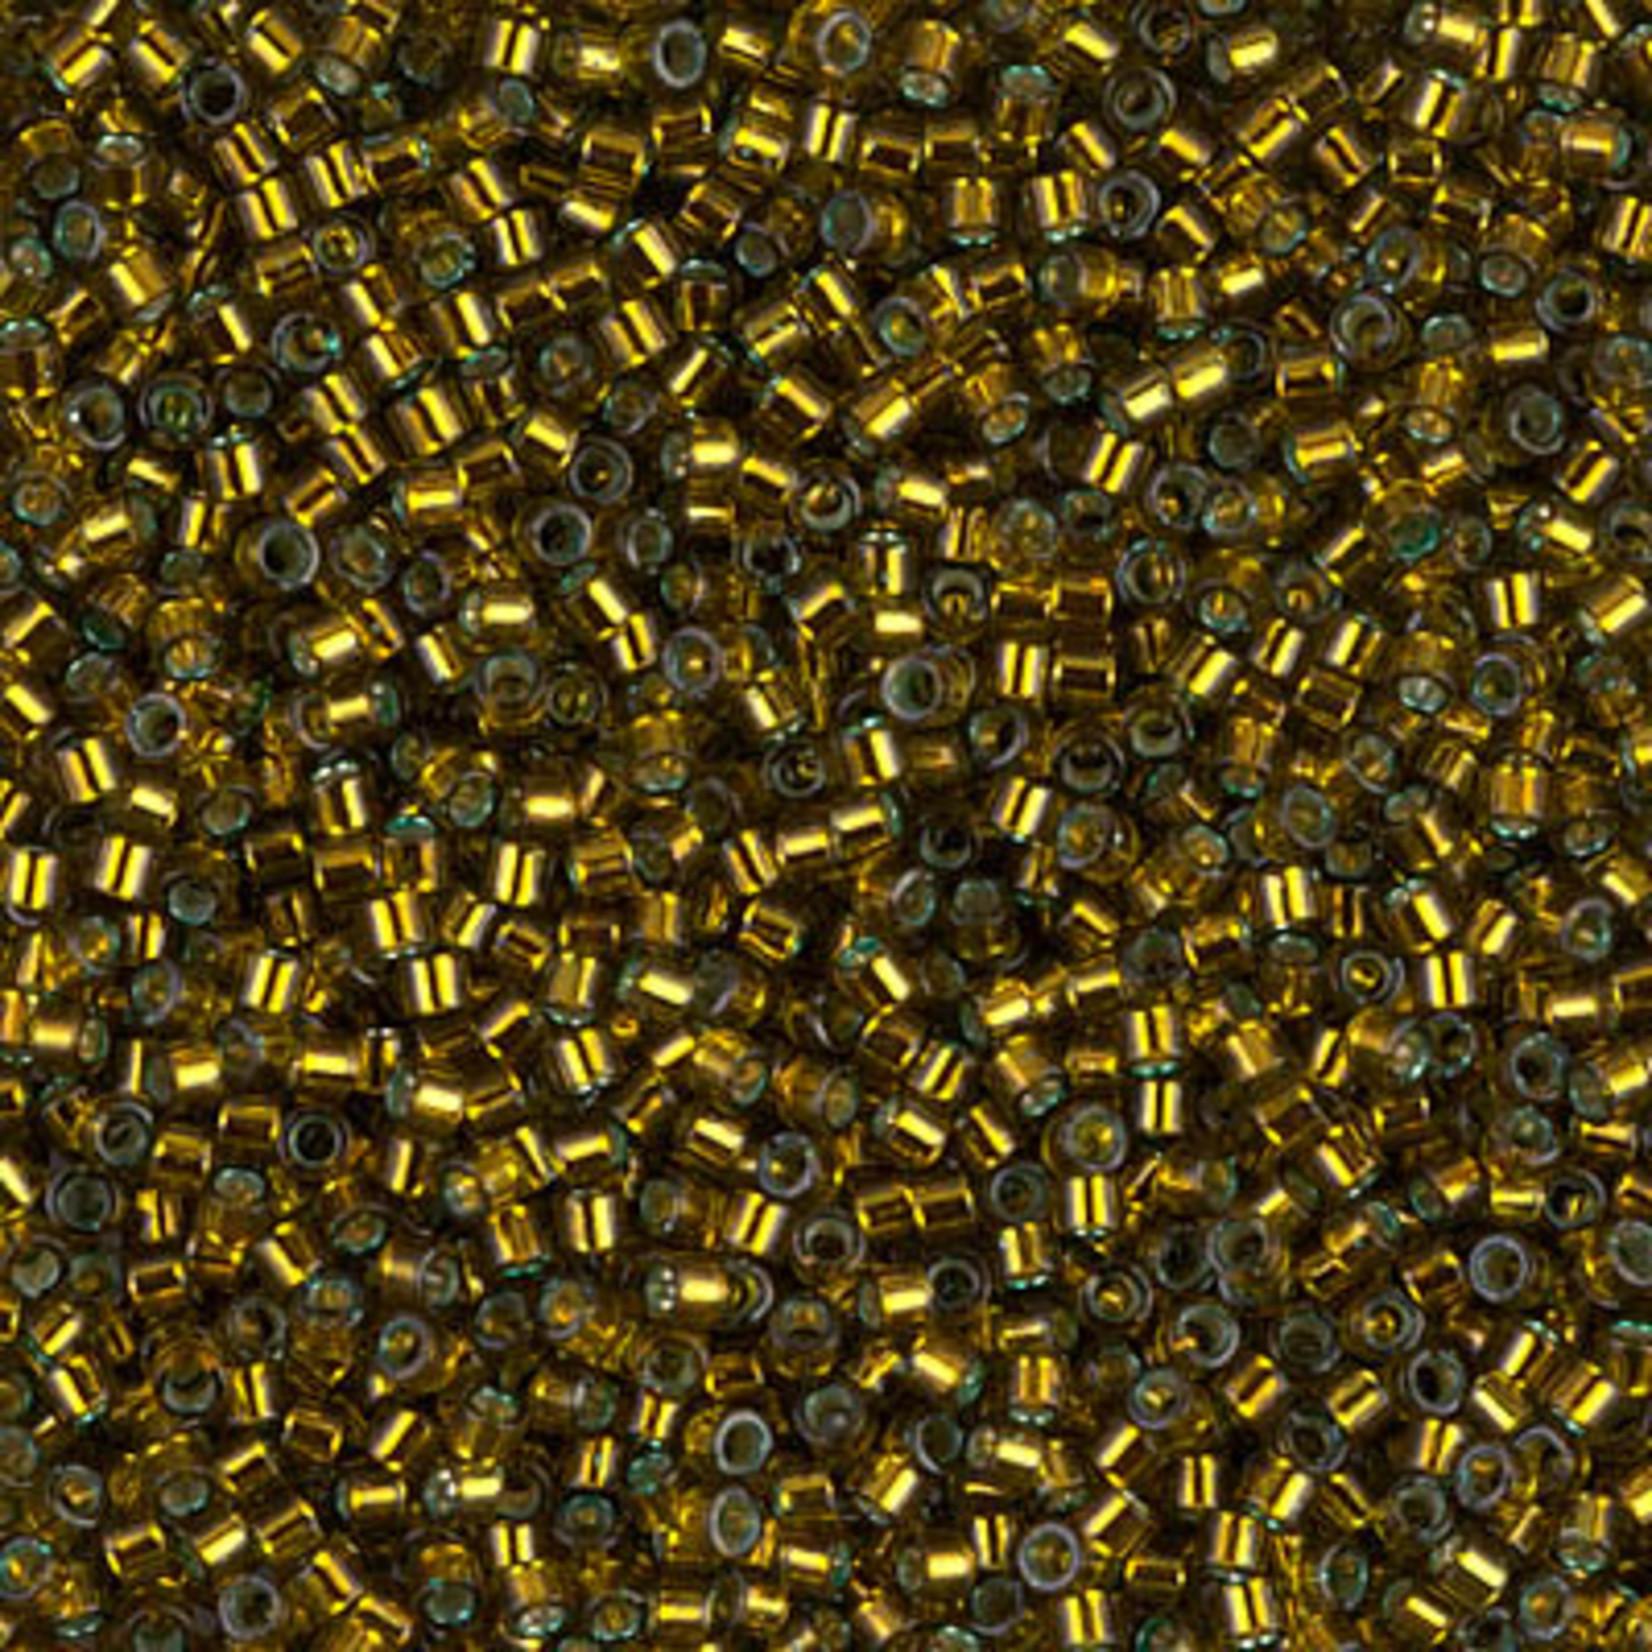 Miyuki 7.2 GM DB0604 11/0 Delica: Golden Olive T/SL (D) (APX 1400 PCS)